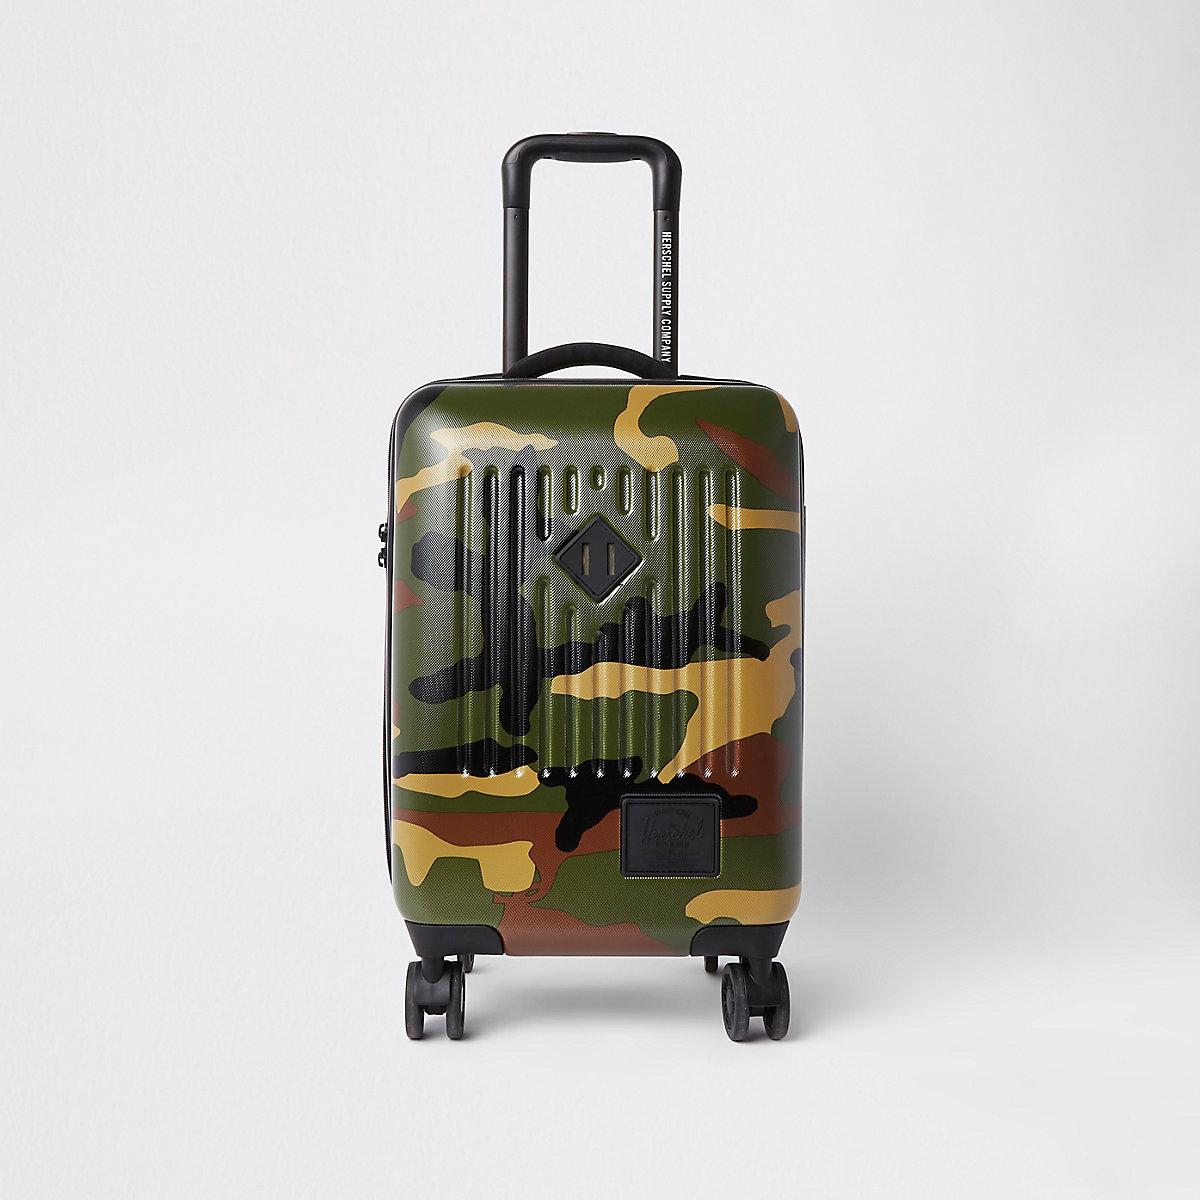 Herschel green camo Trade carry on suitcase